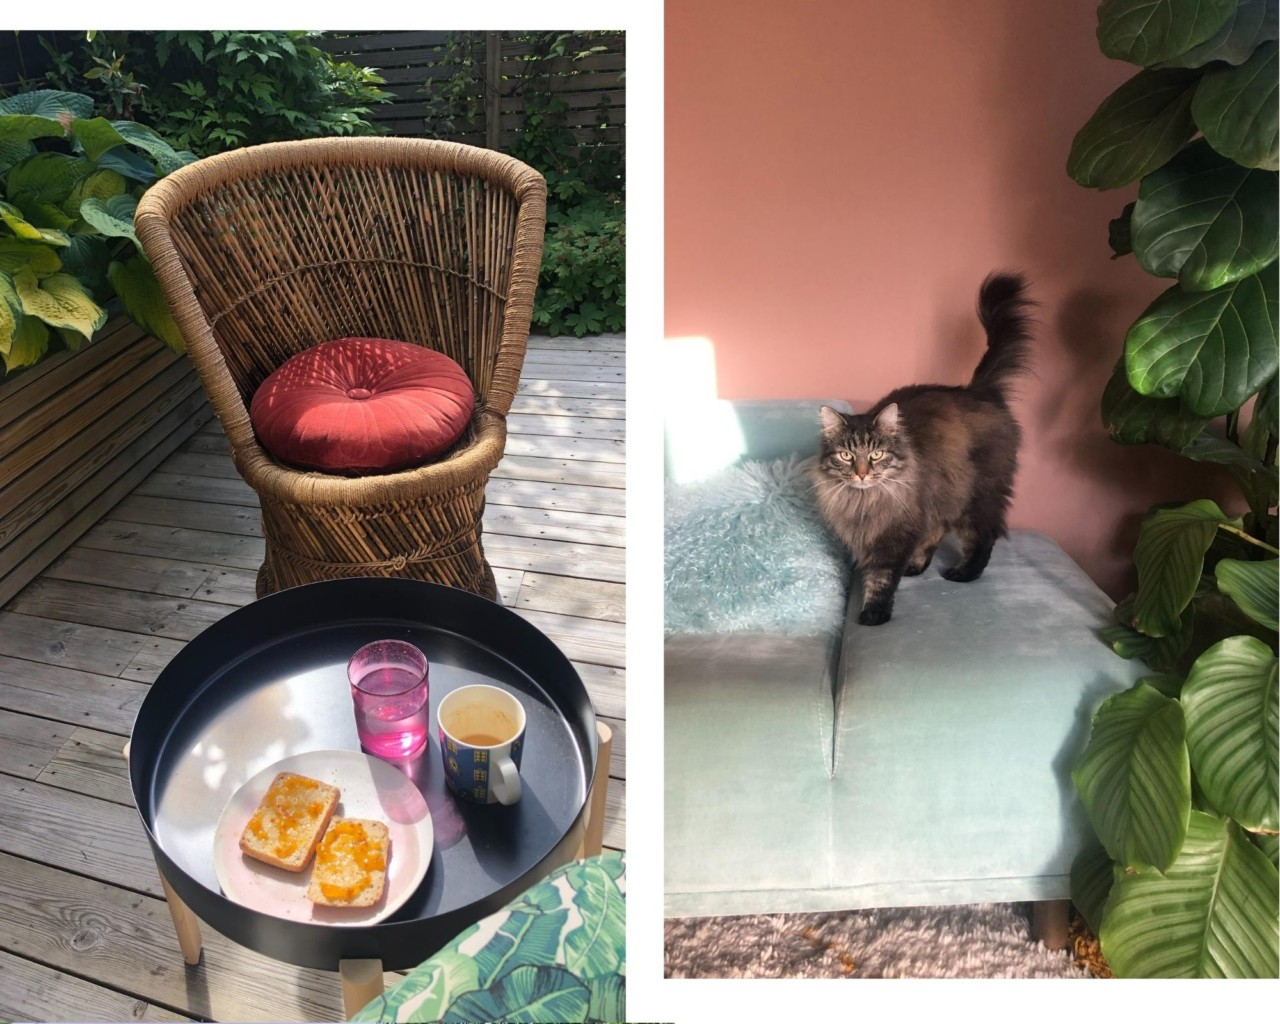 regnskogen-terrasse-nabokatt-sofa-fiolinfiken-hjemme